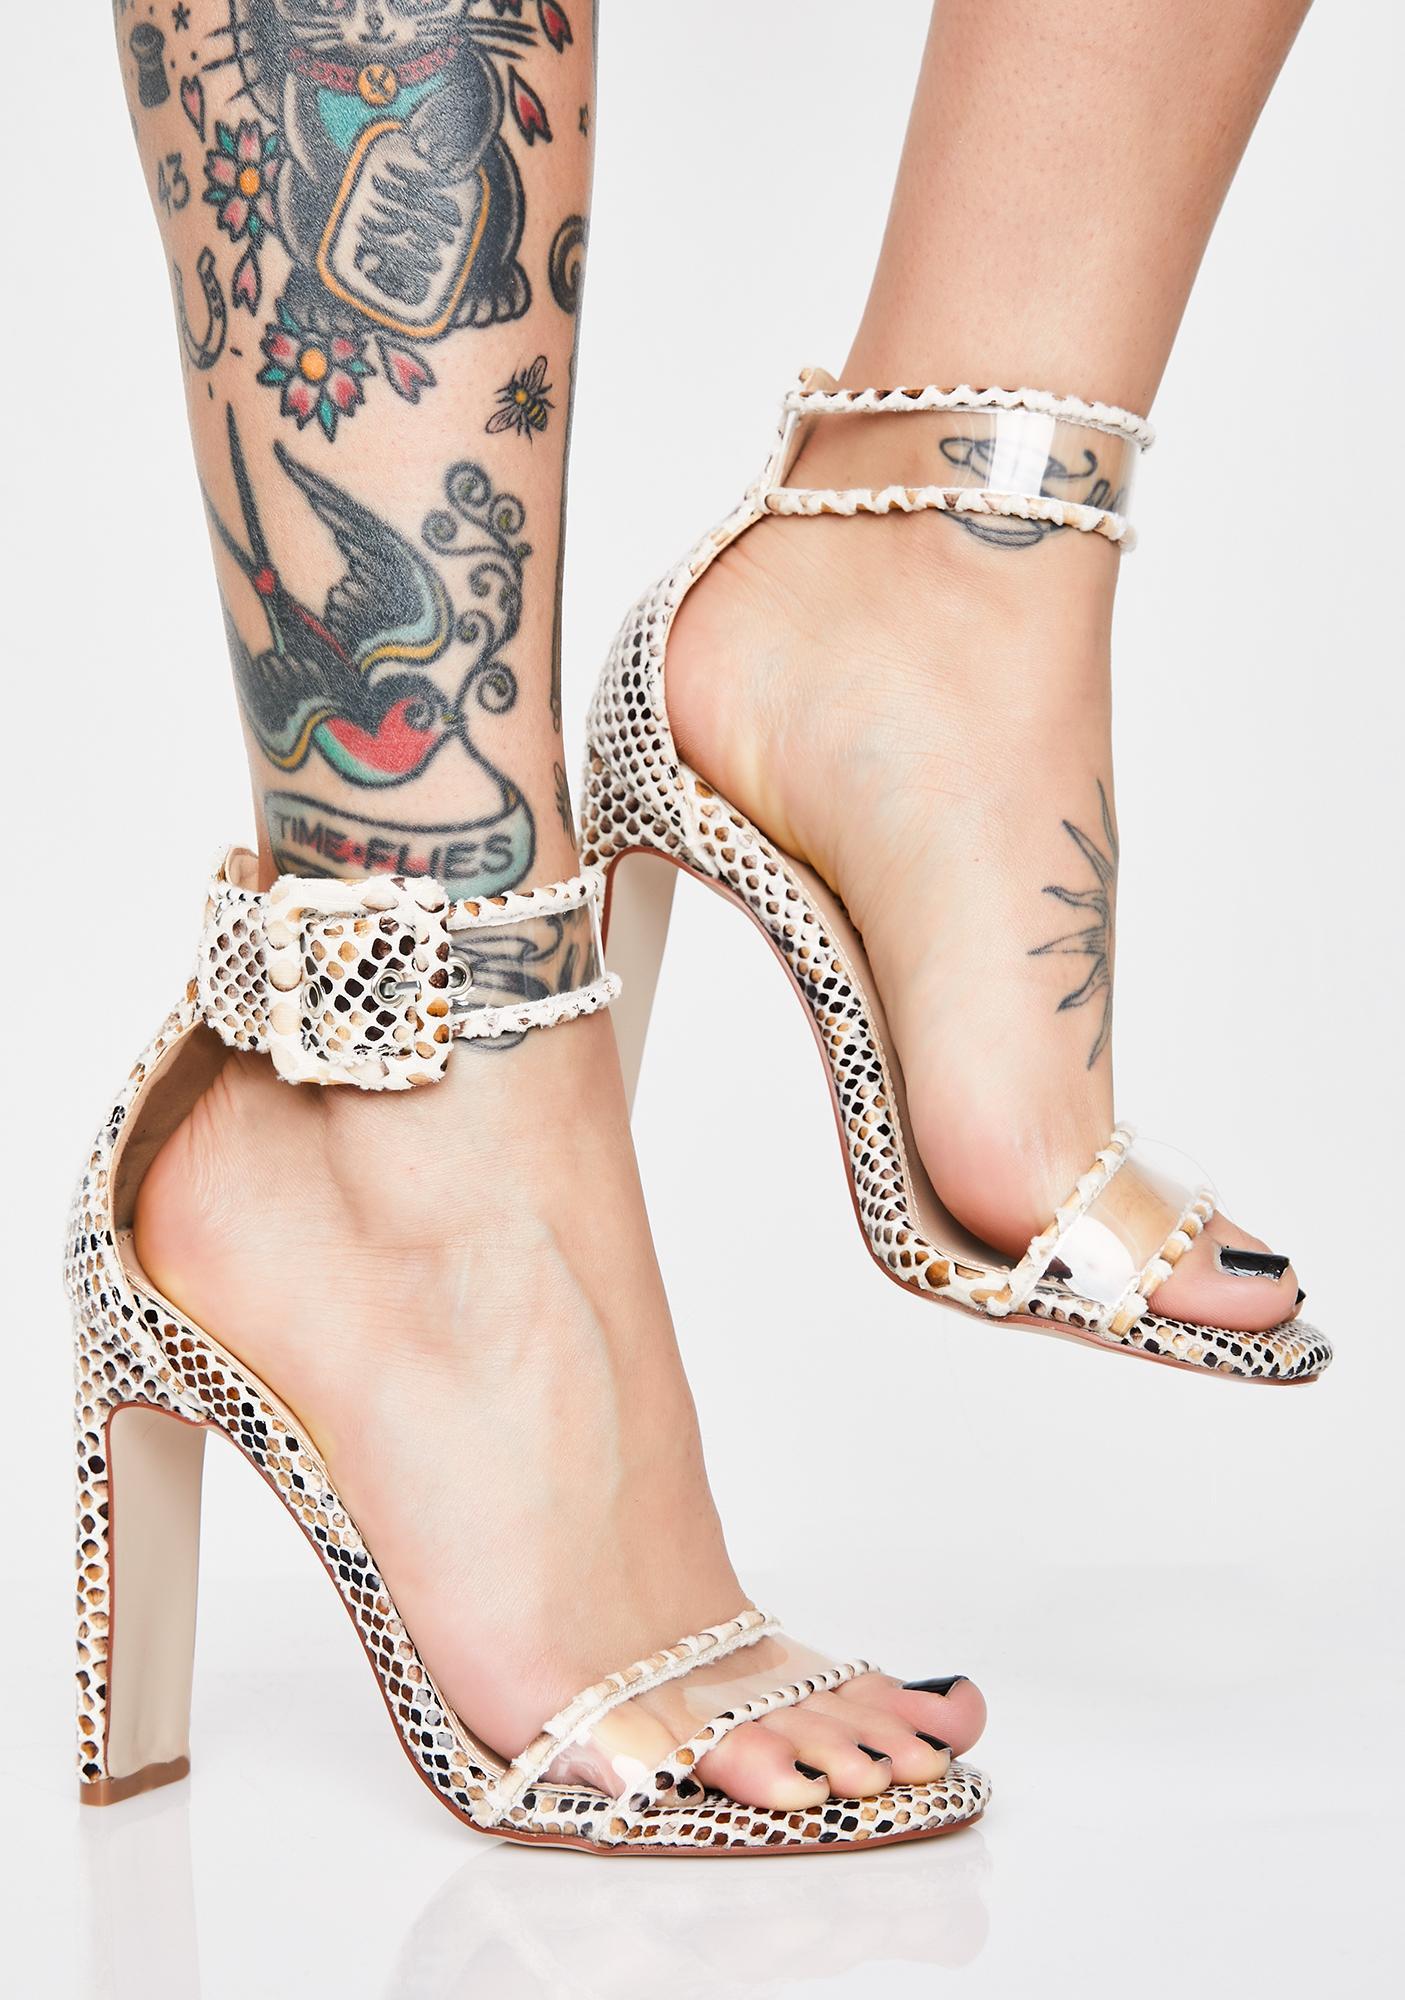 AZALEA WANG Press Charges Snakeskin Heels